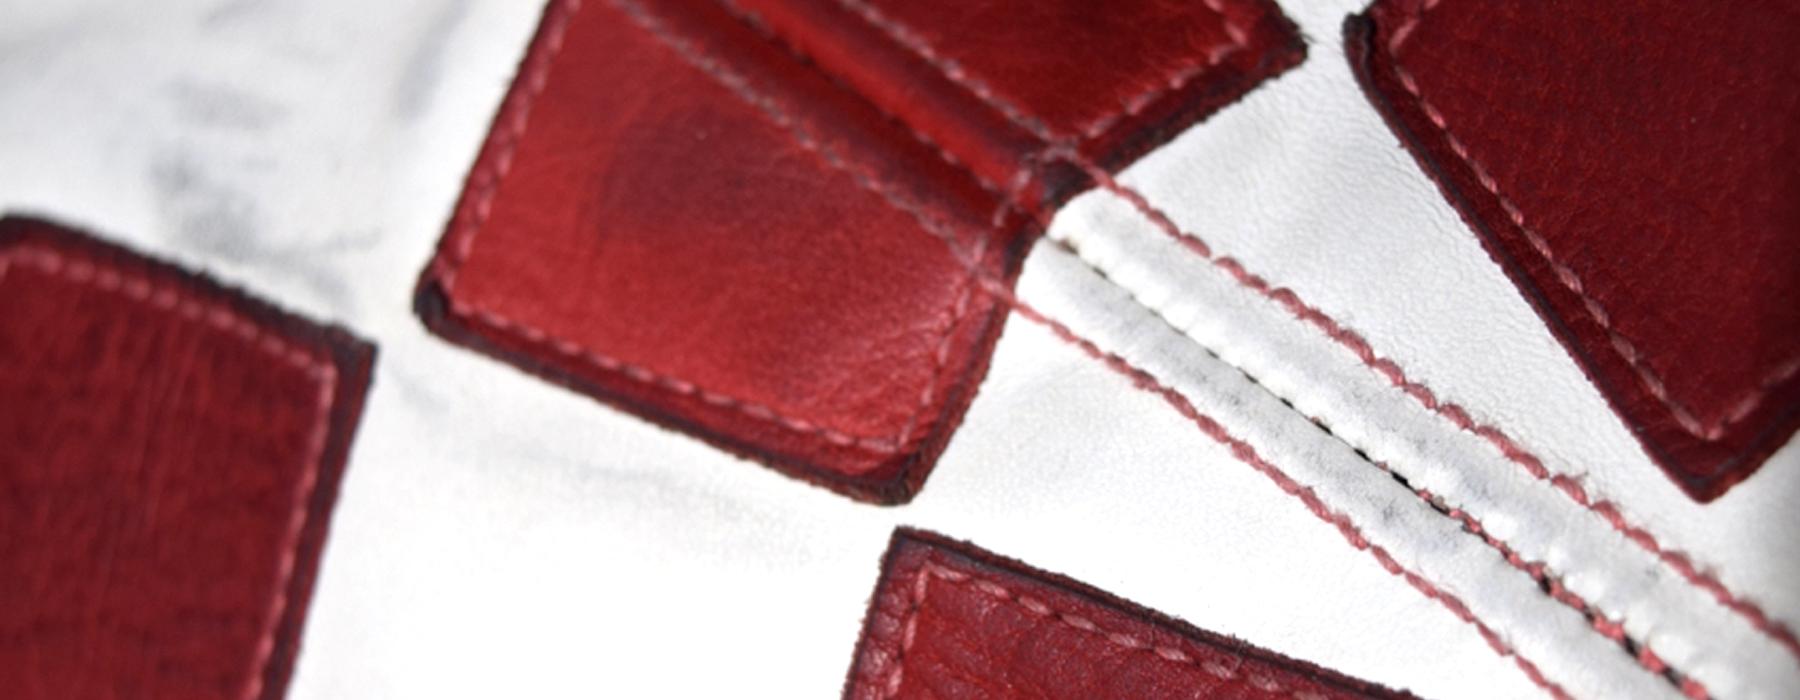 de curae | Candyman Racing Suit, vest right side detail – Thorsten Schlesinger